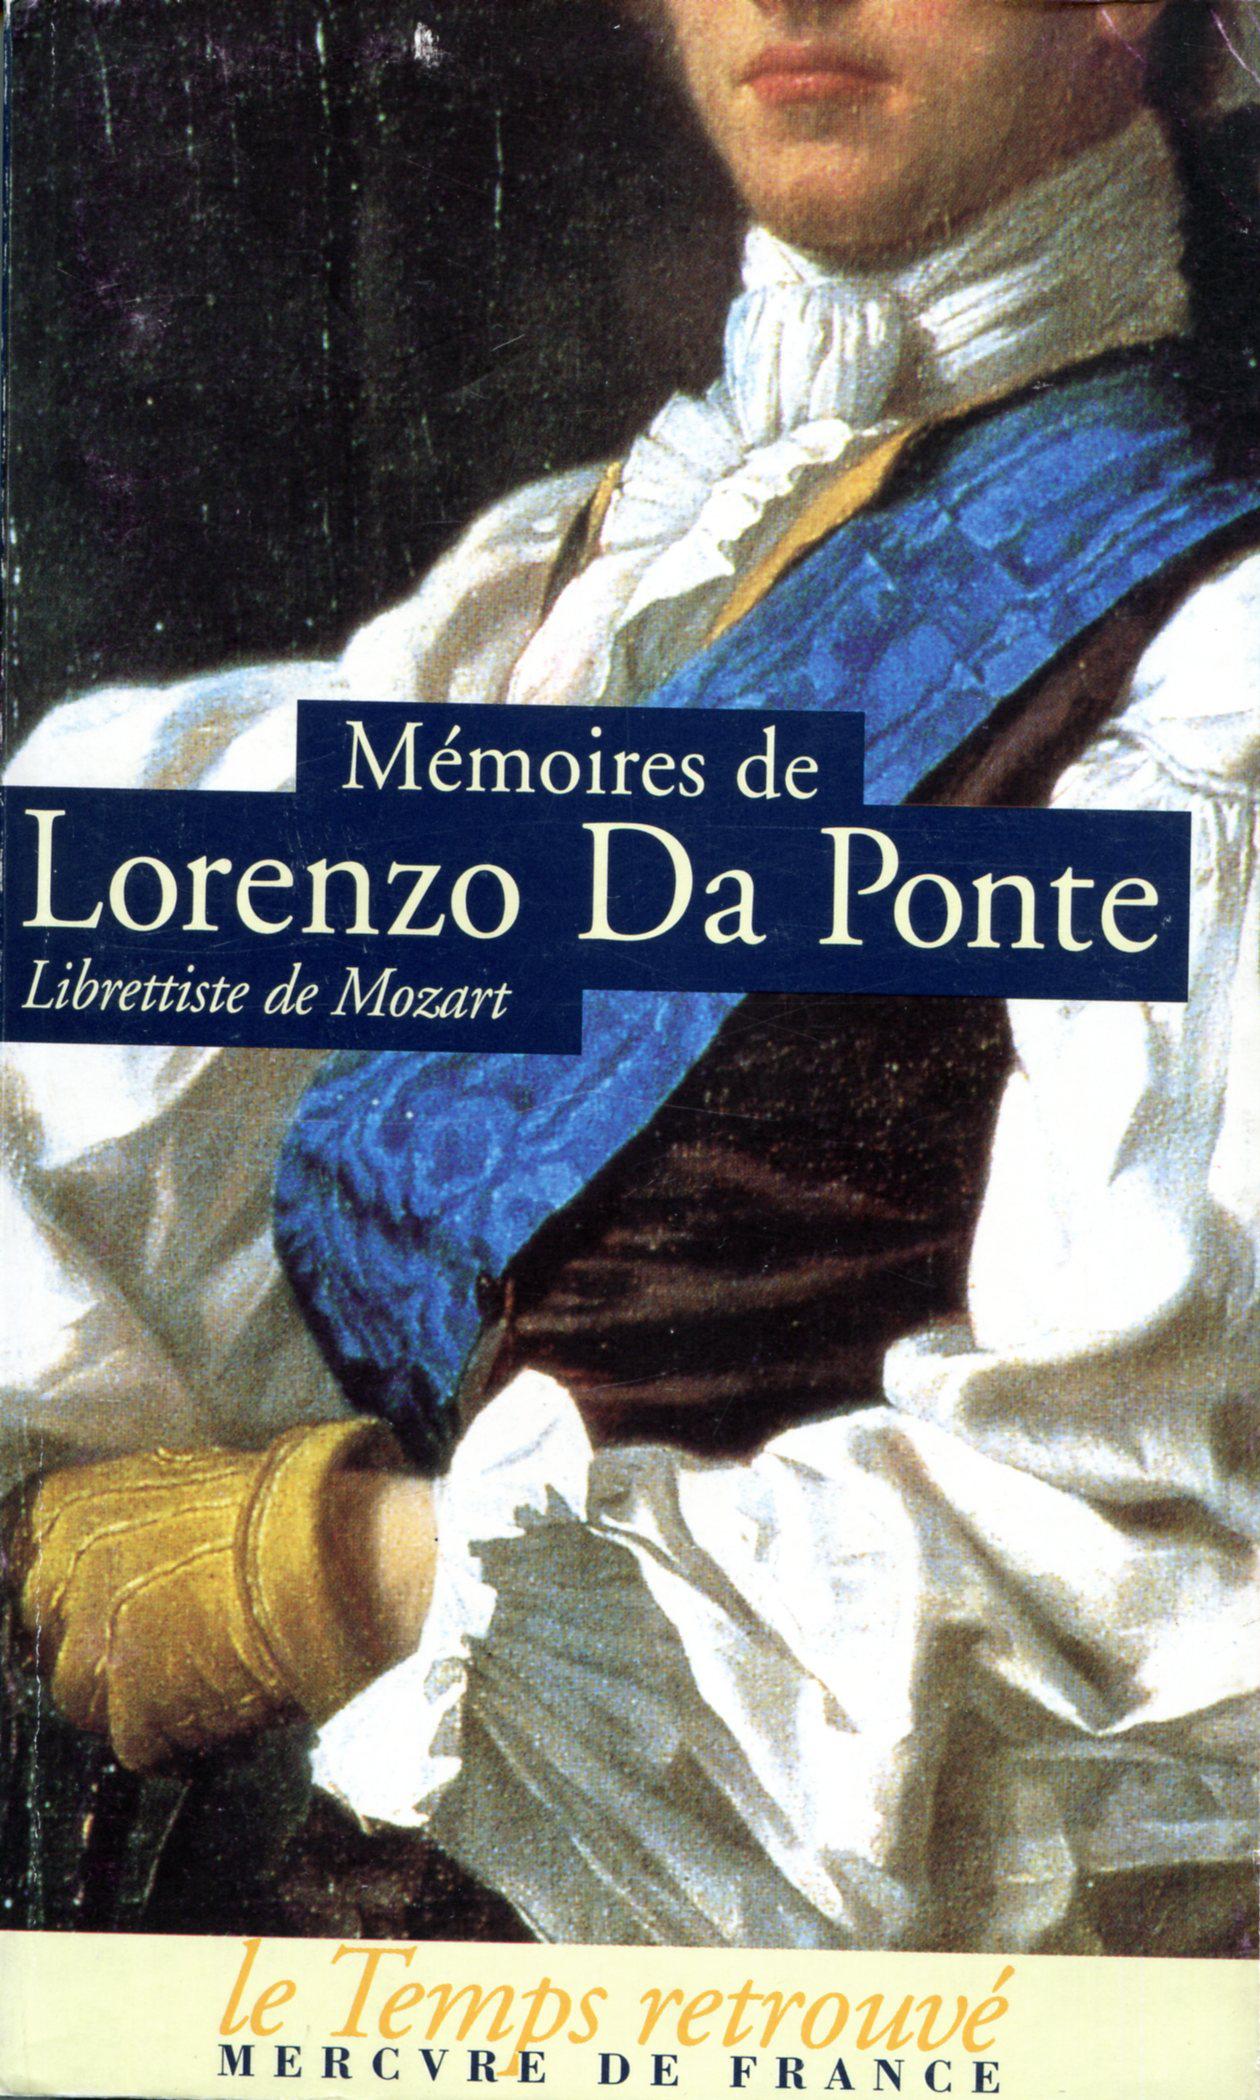 1800 Da Ponte Lorenzo Mémoires.jpg